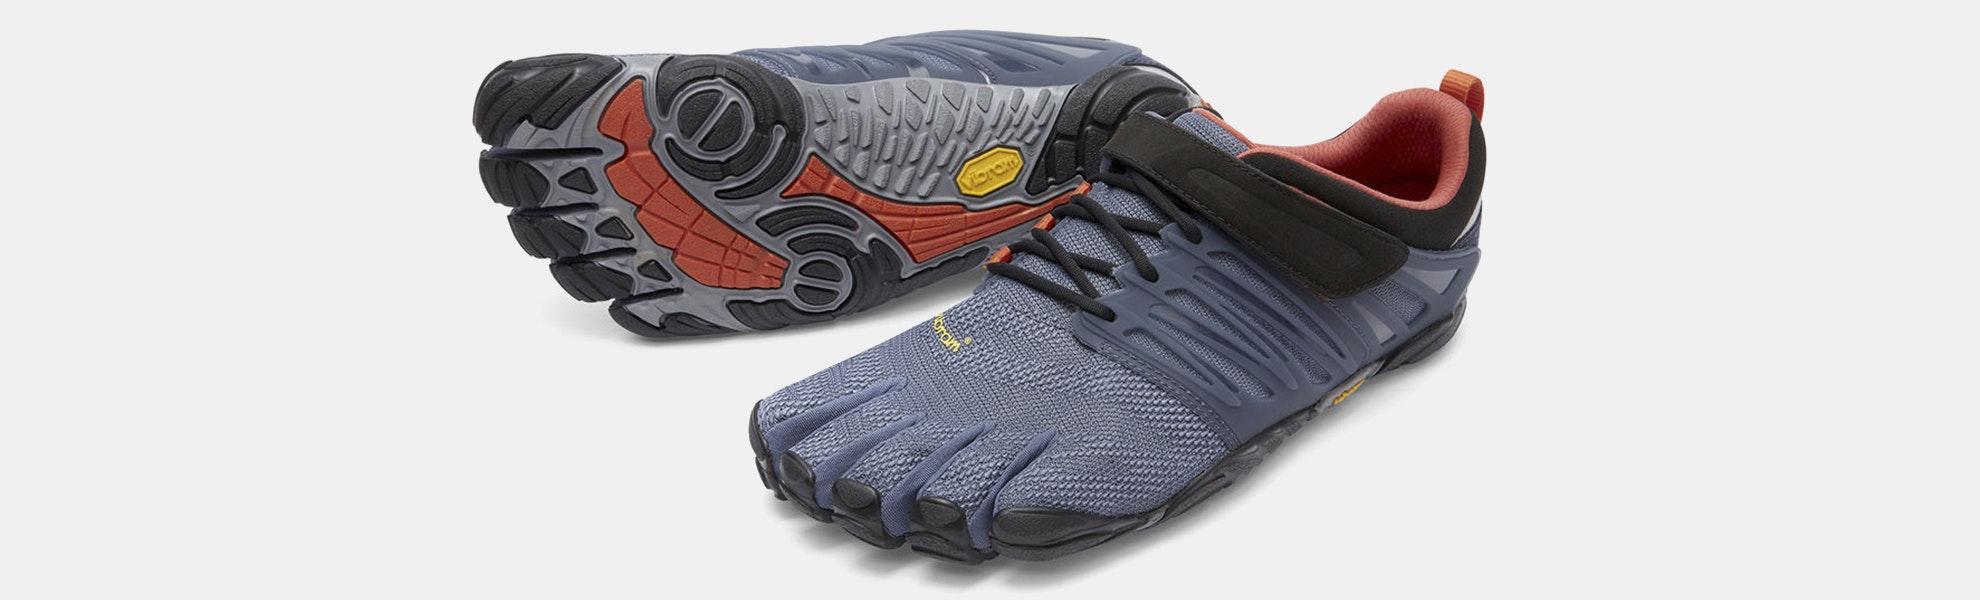 Vibram FiveFingers V-Train Shoes